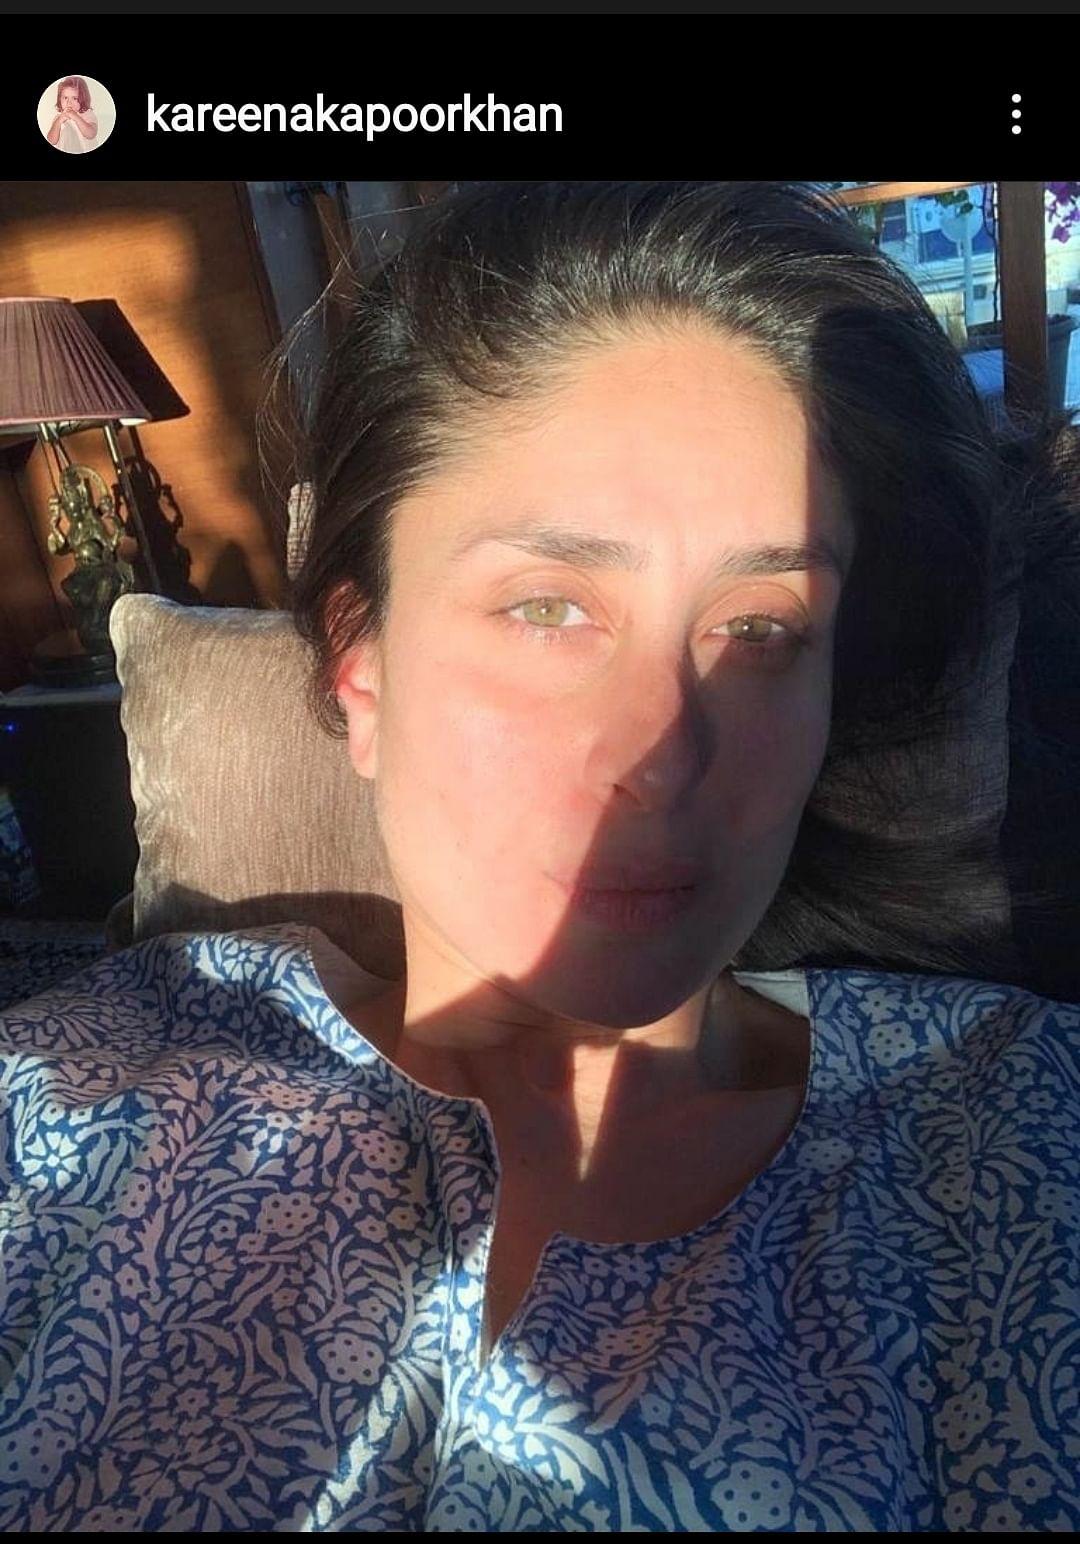 """Girls just wanna have sun 🌞"" - Kareena Kapoor Khan"